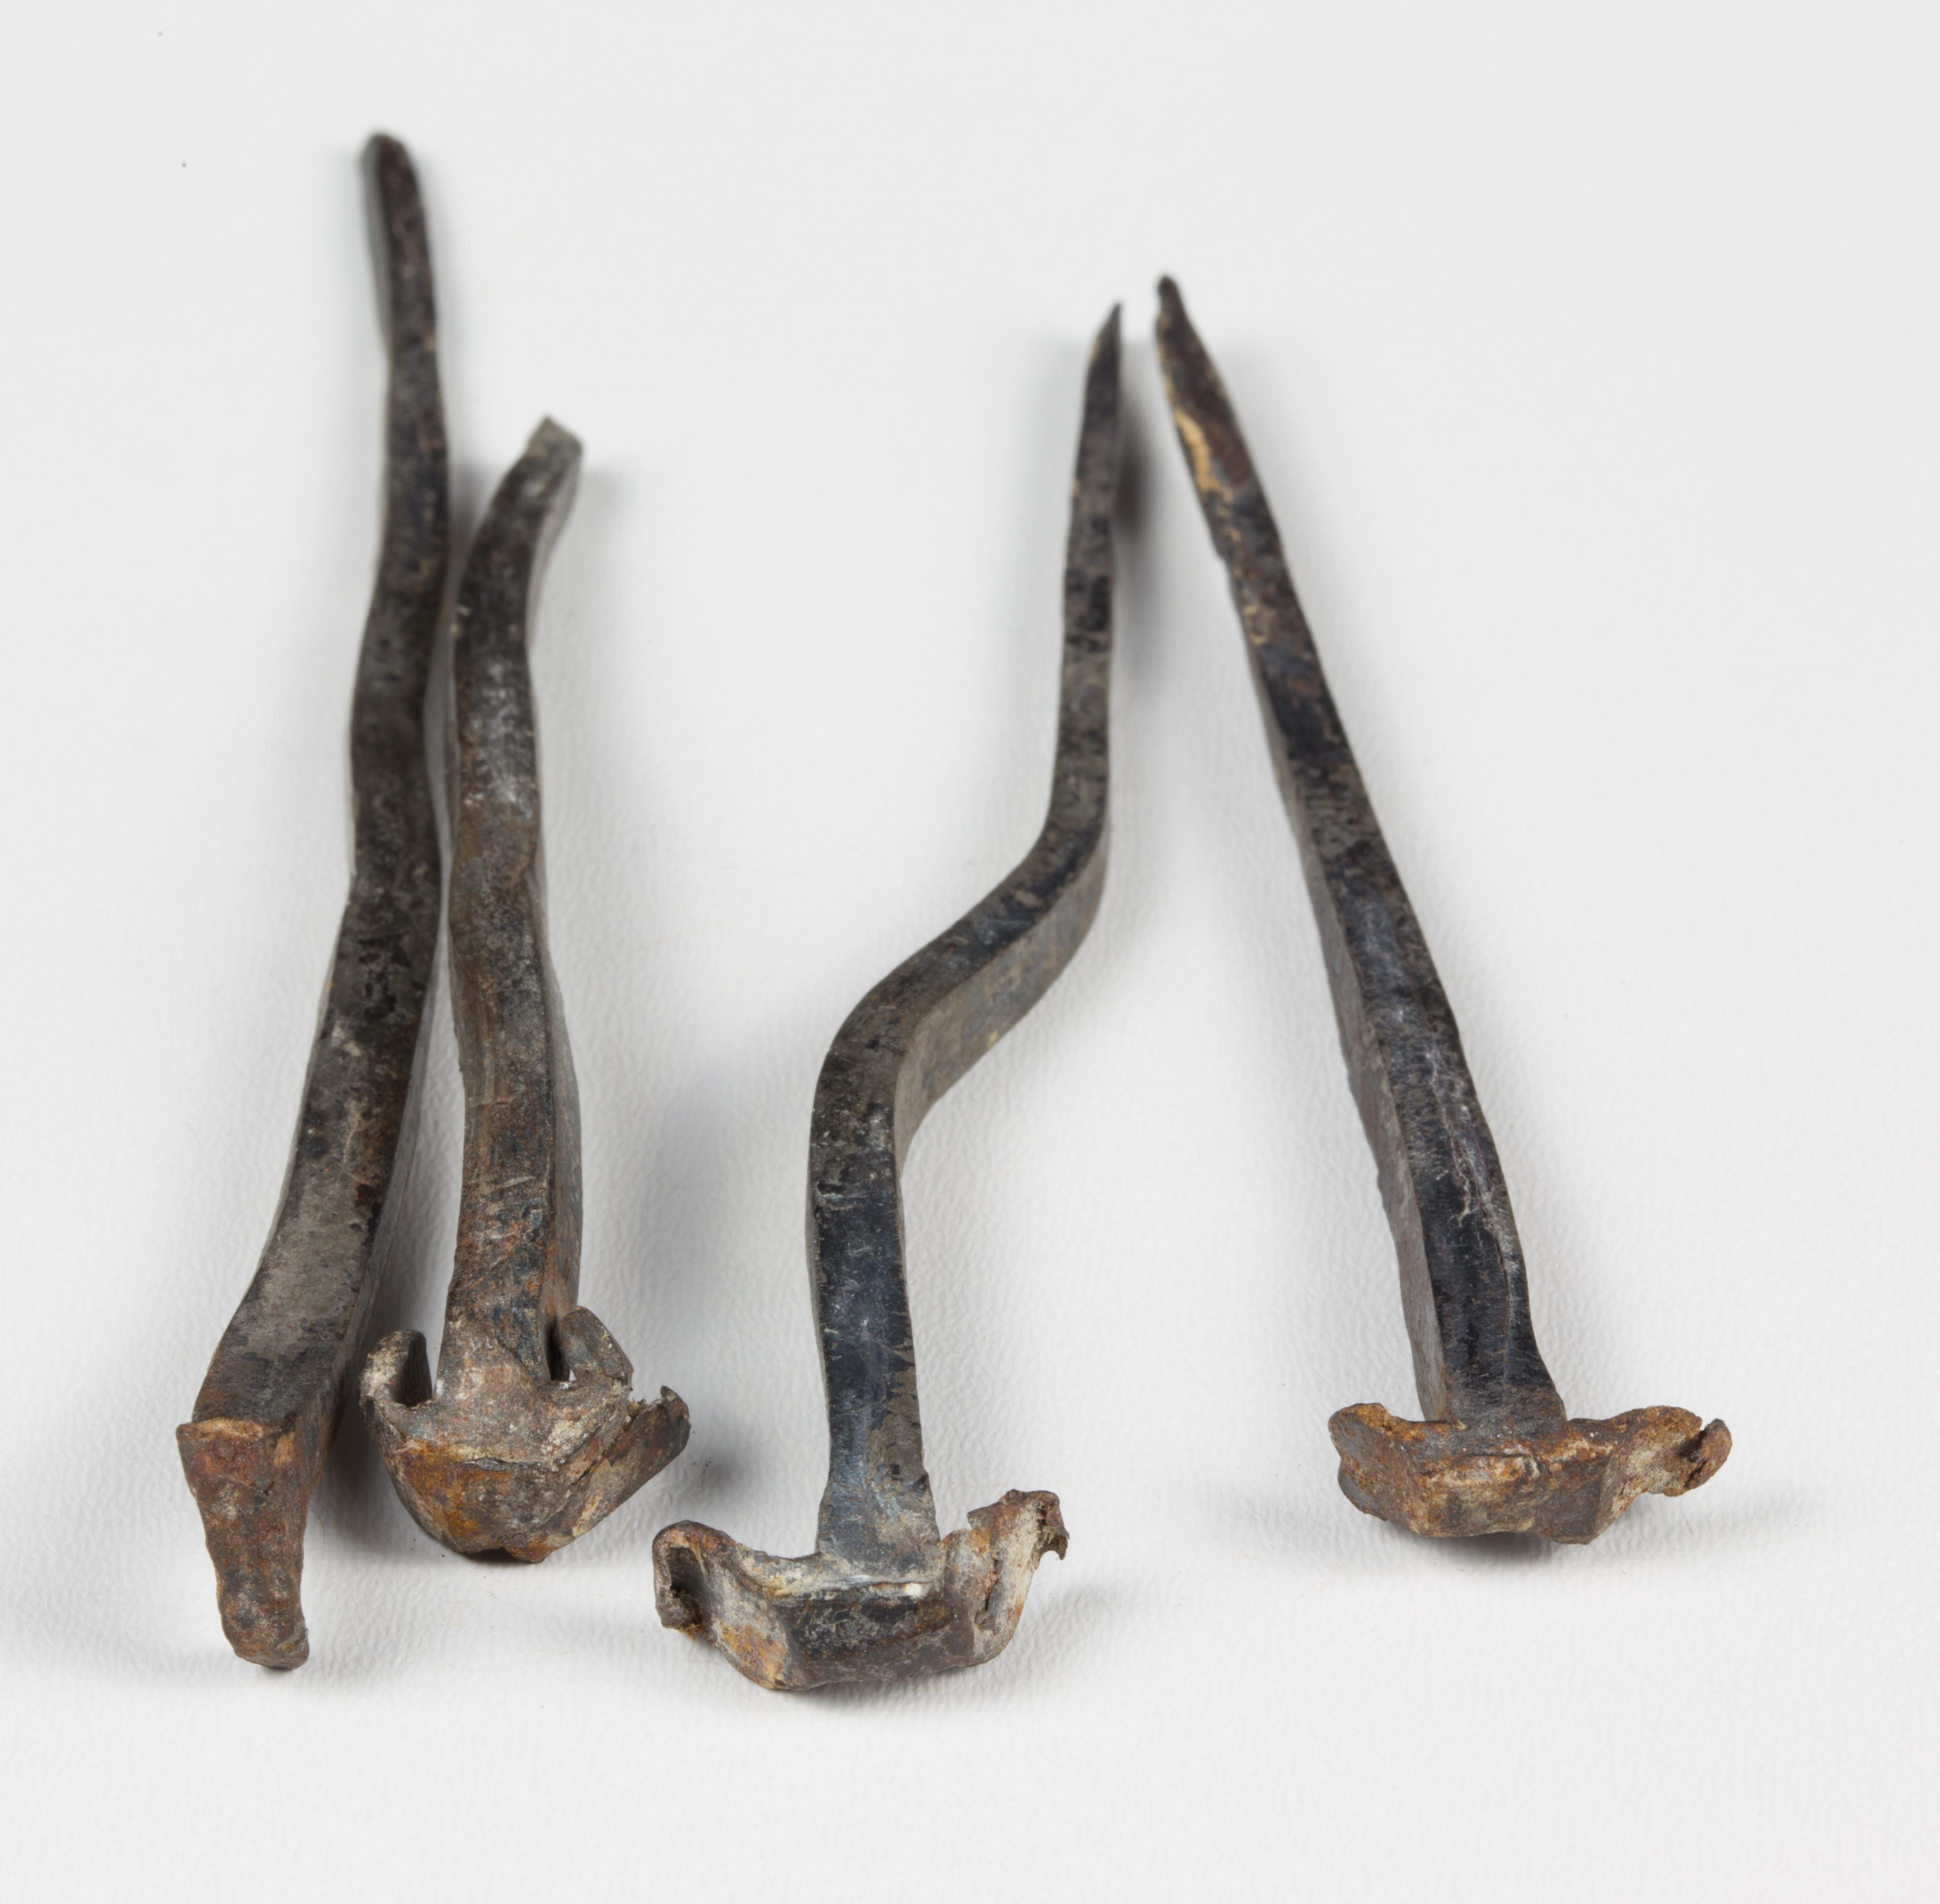 Century 3 nails